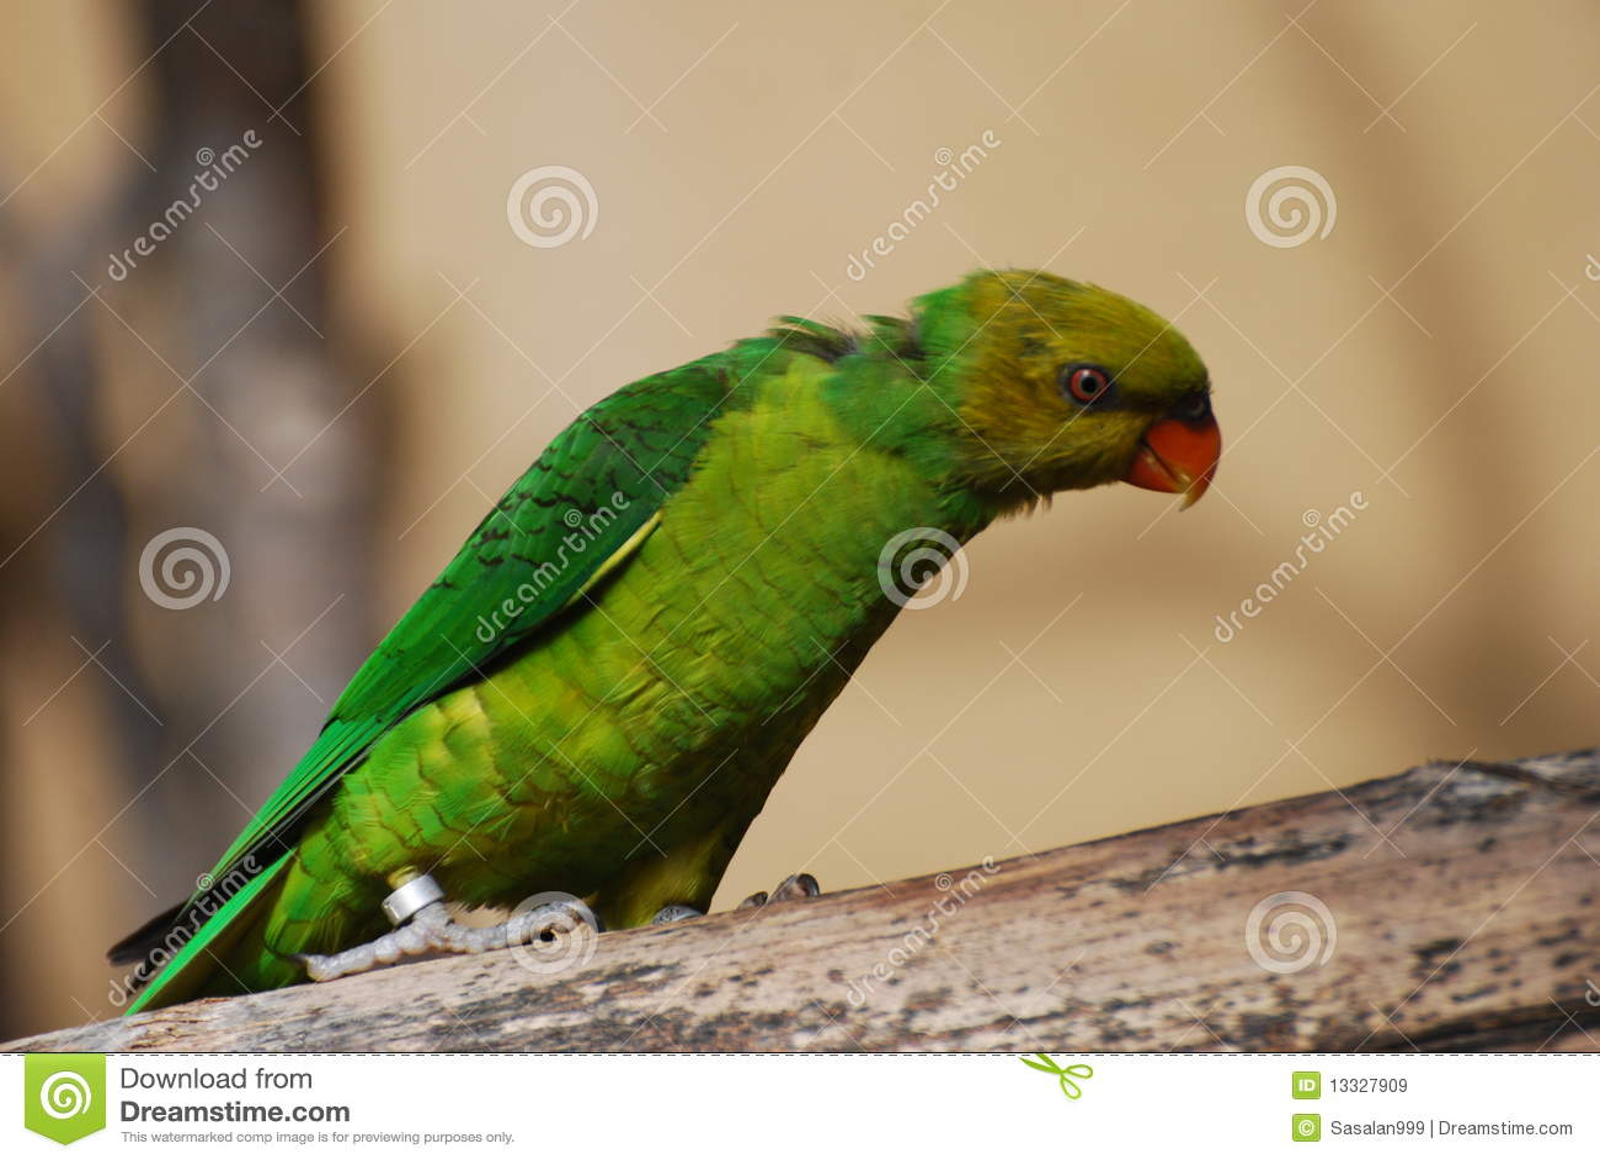 Zielona papuga